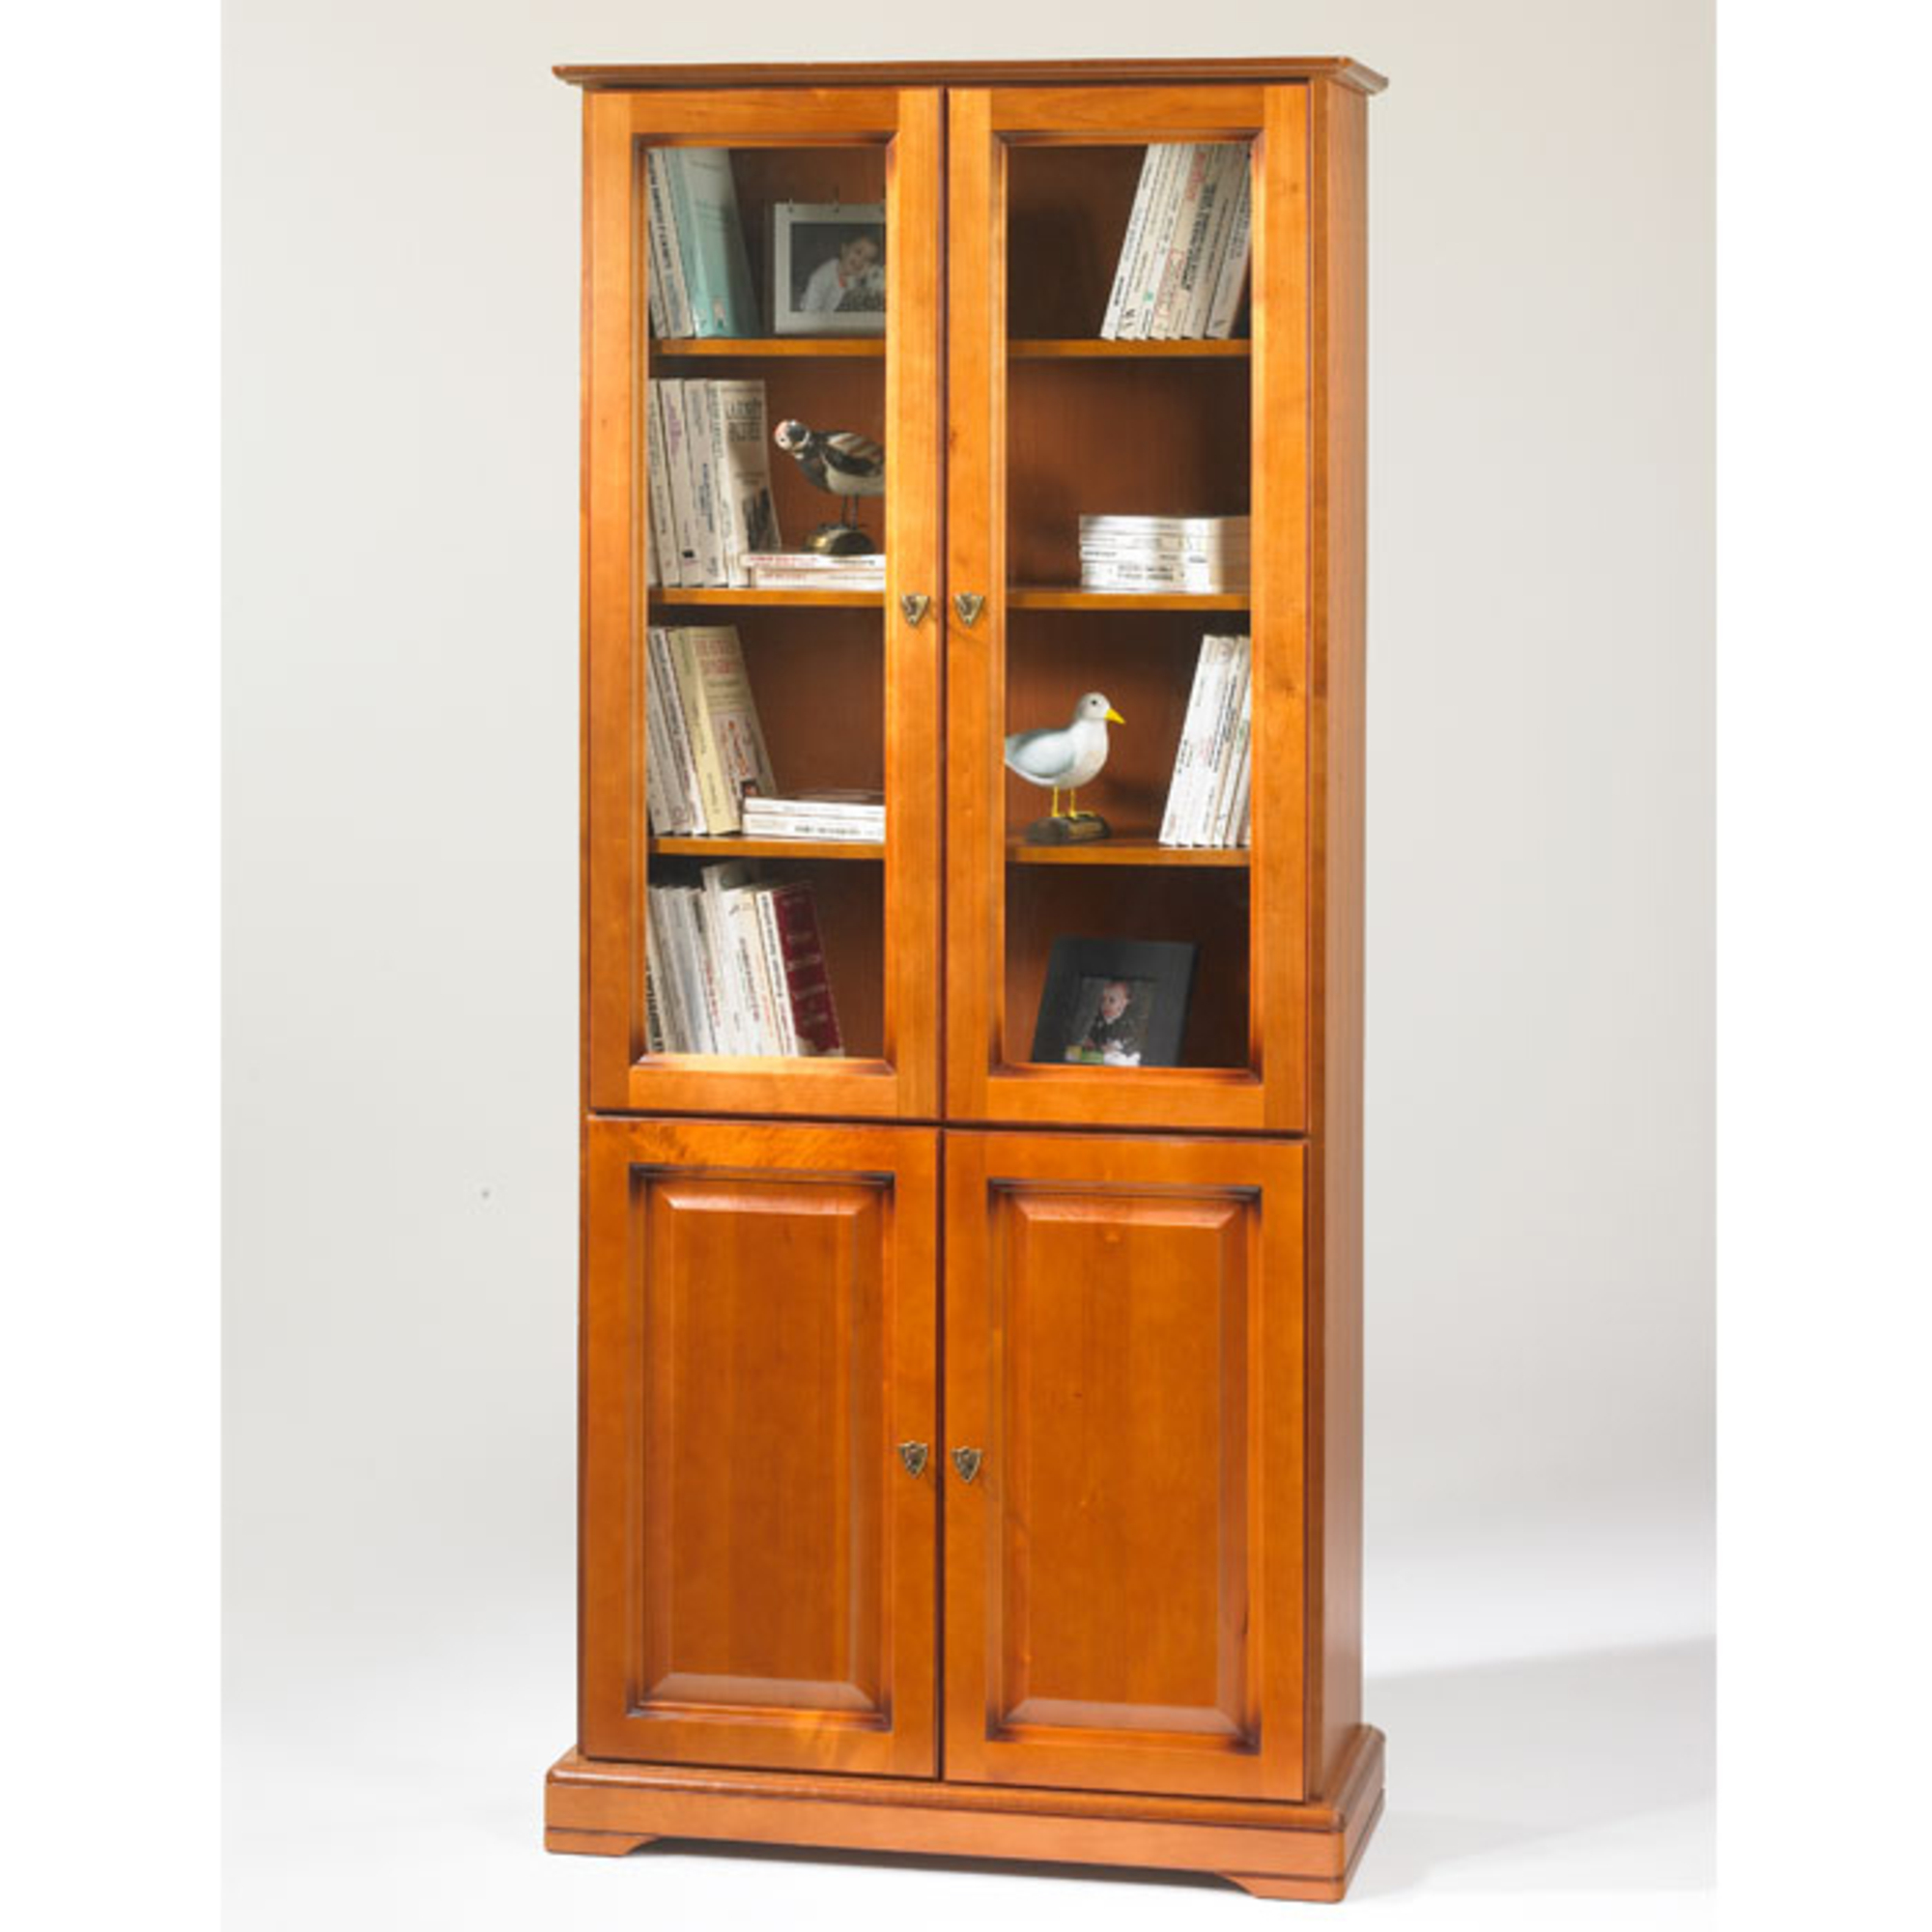 Biblioth que 2 portes pleines 2 portes vitr es style louis philippe alsace - Acheter une bibliotheque ...